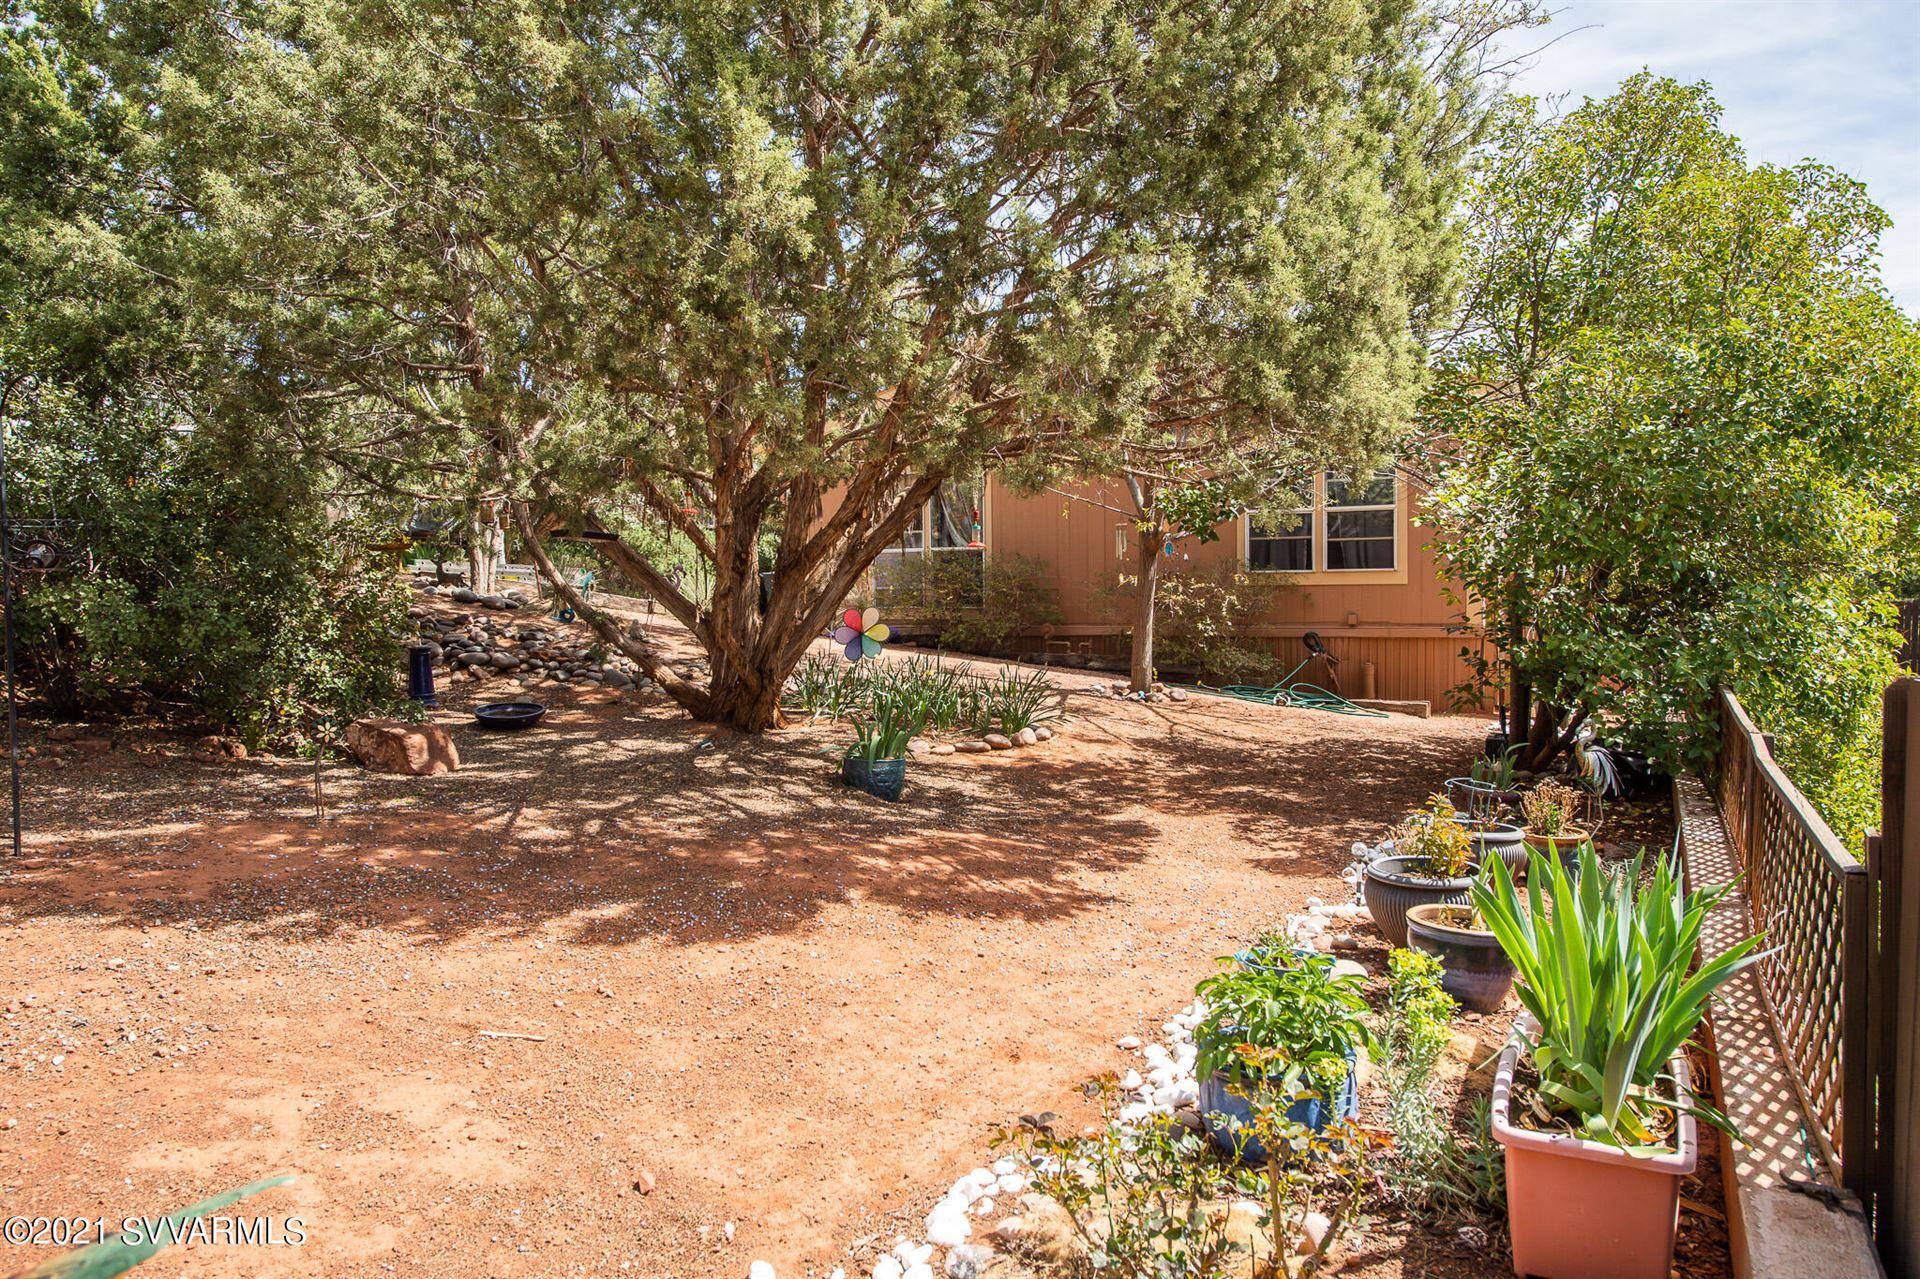 Photo of 40 Buena Vista Lane, Sedona, AZ 86336 (MLS # 526105)